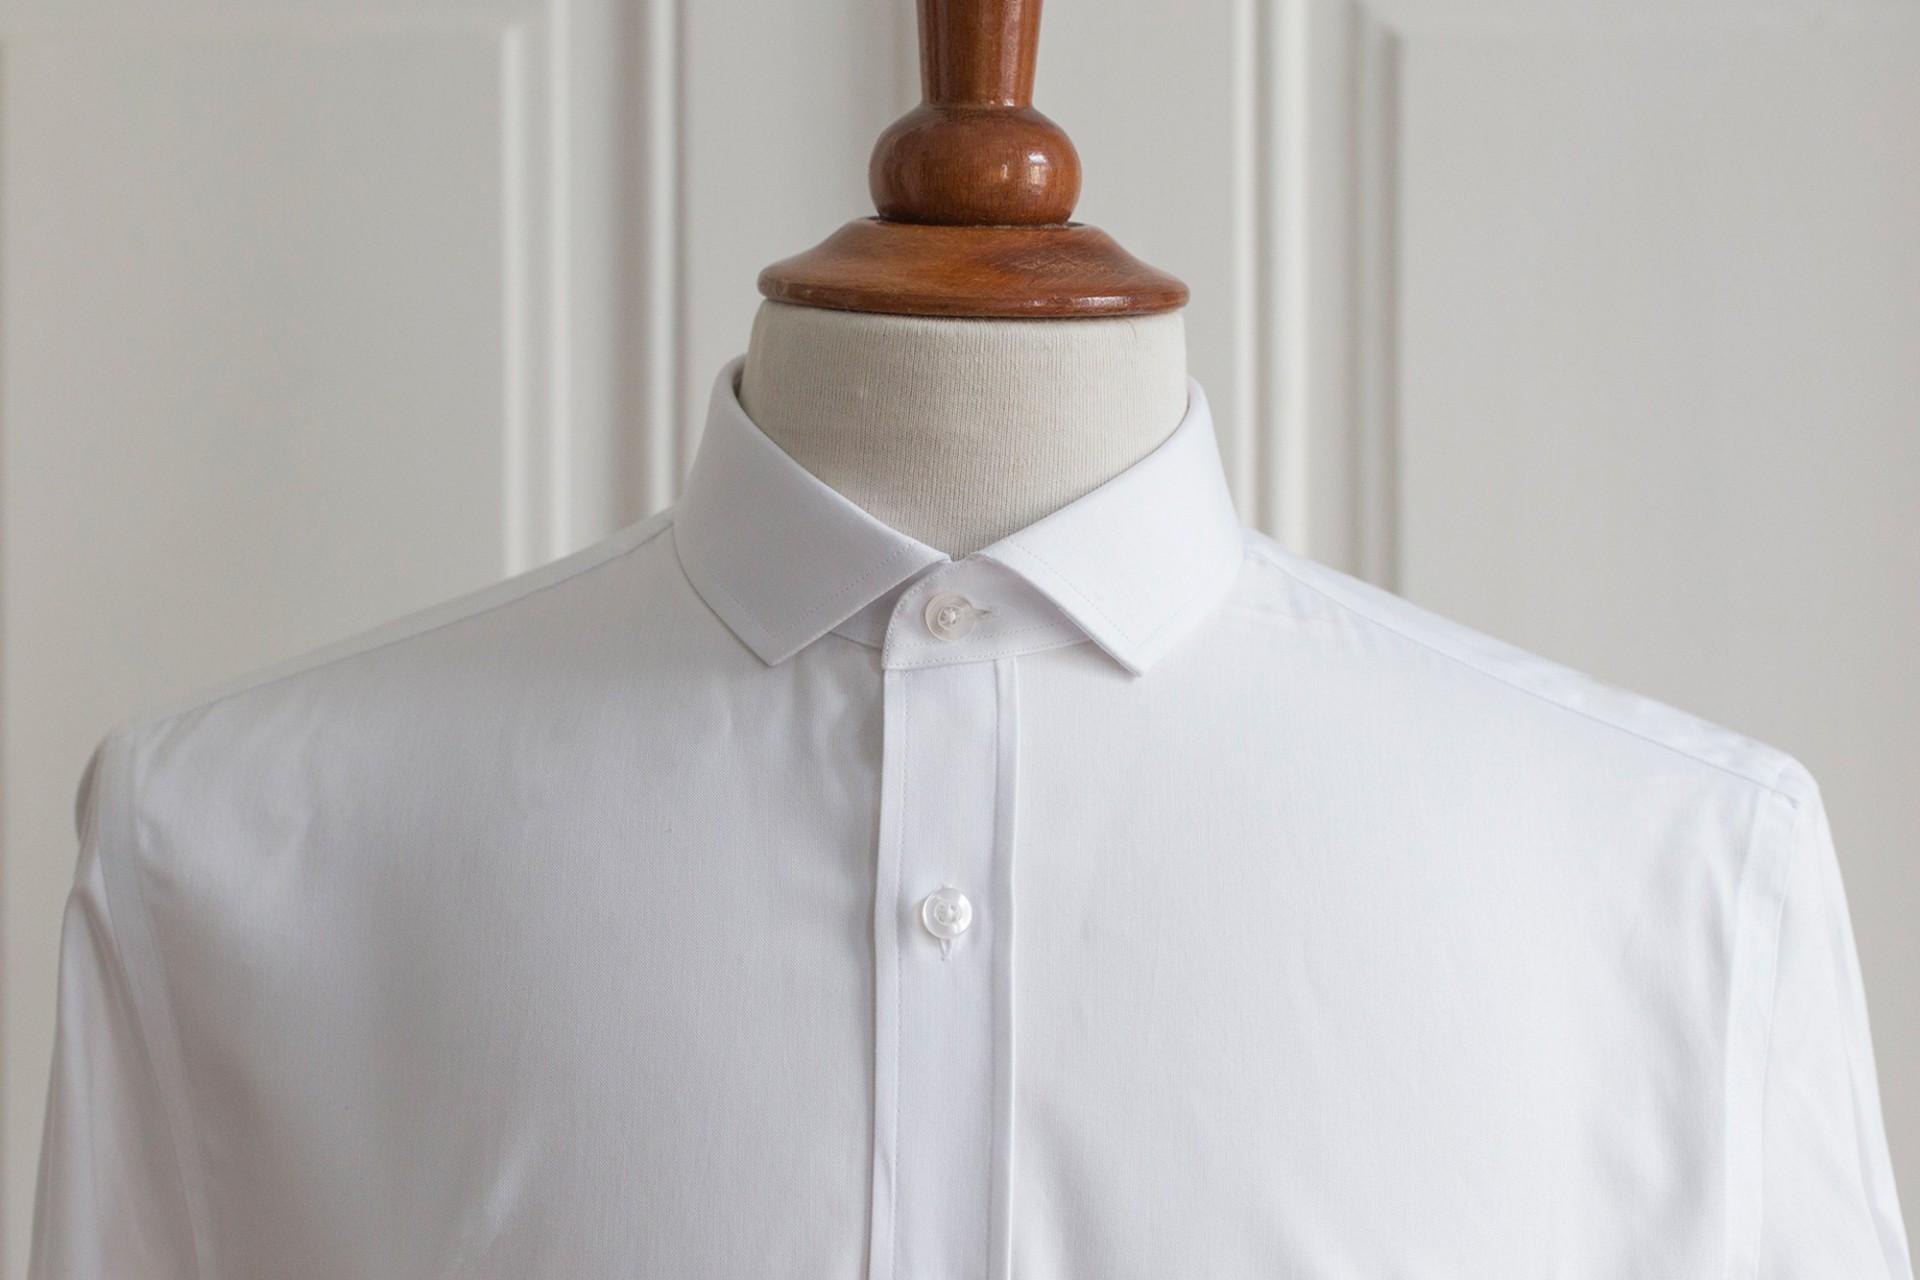 A guide to dress shirt collars deo veritas